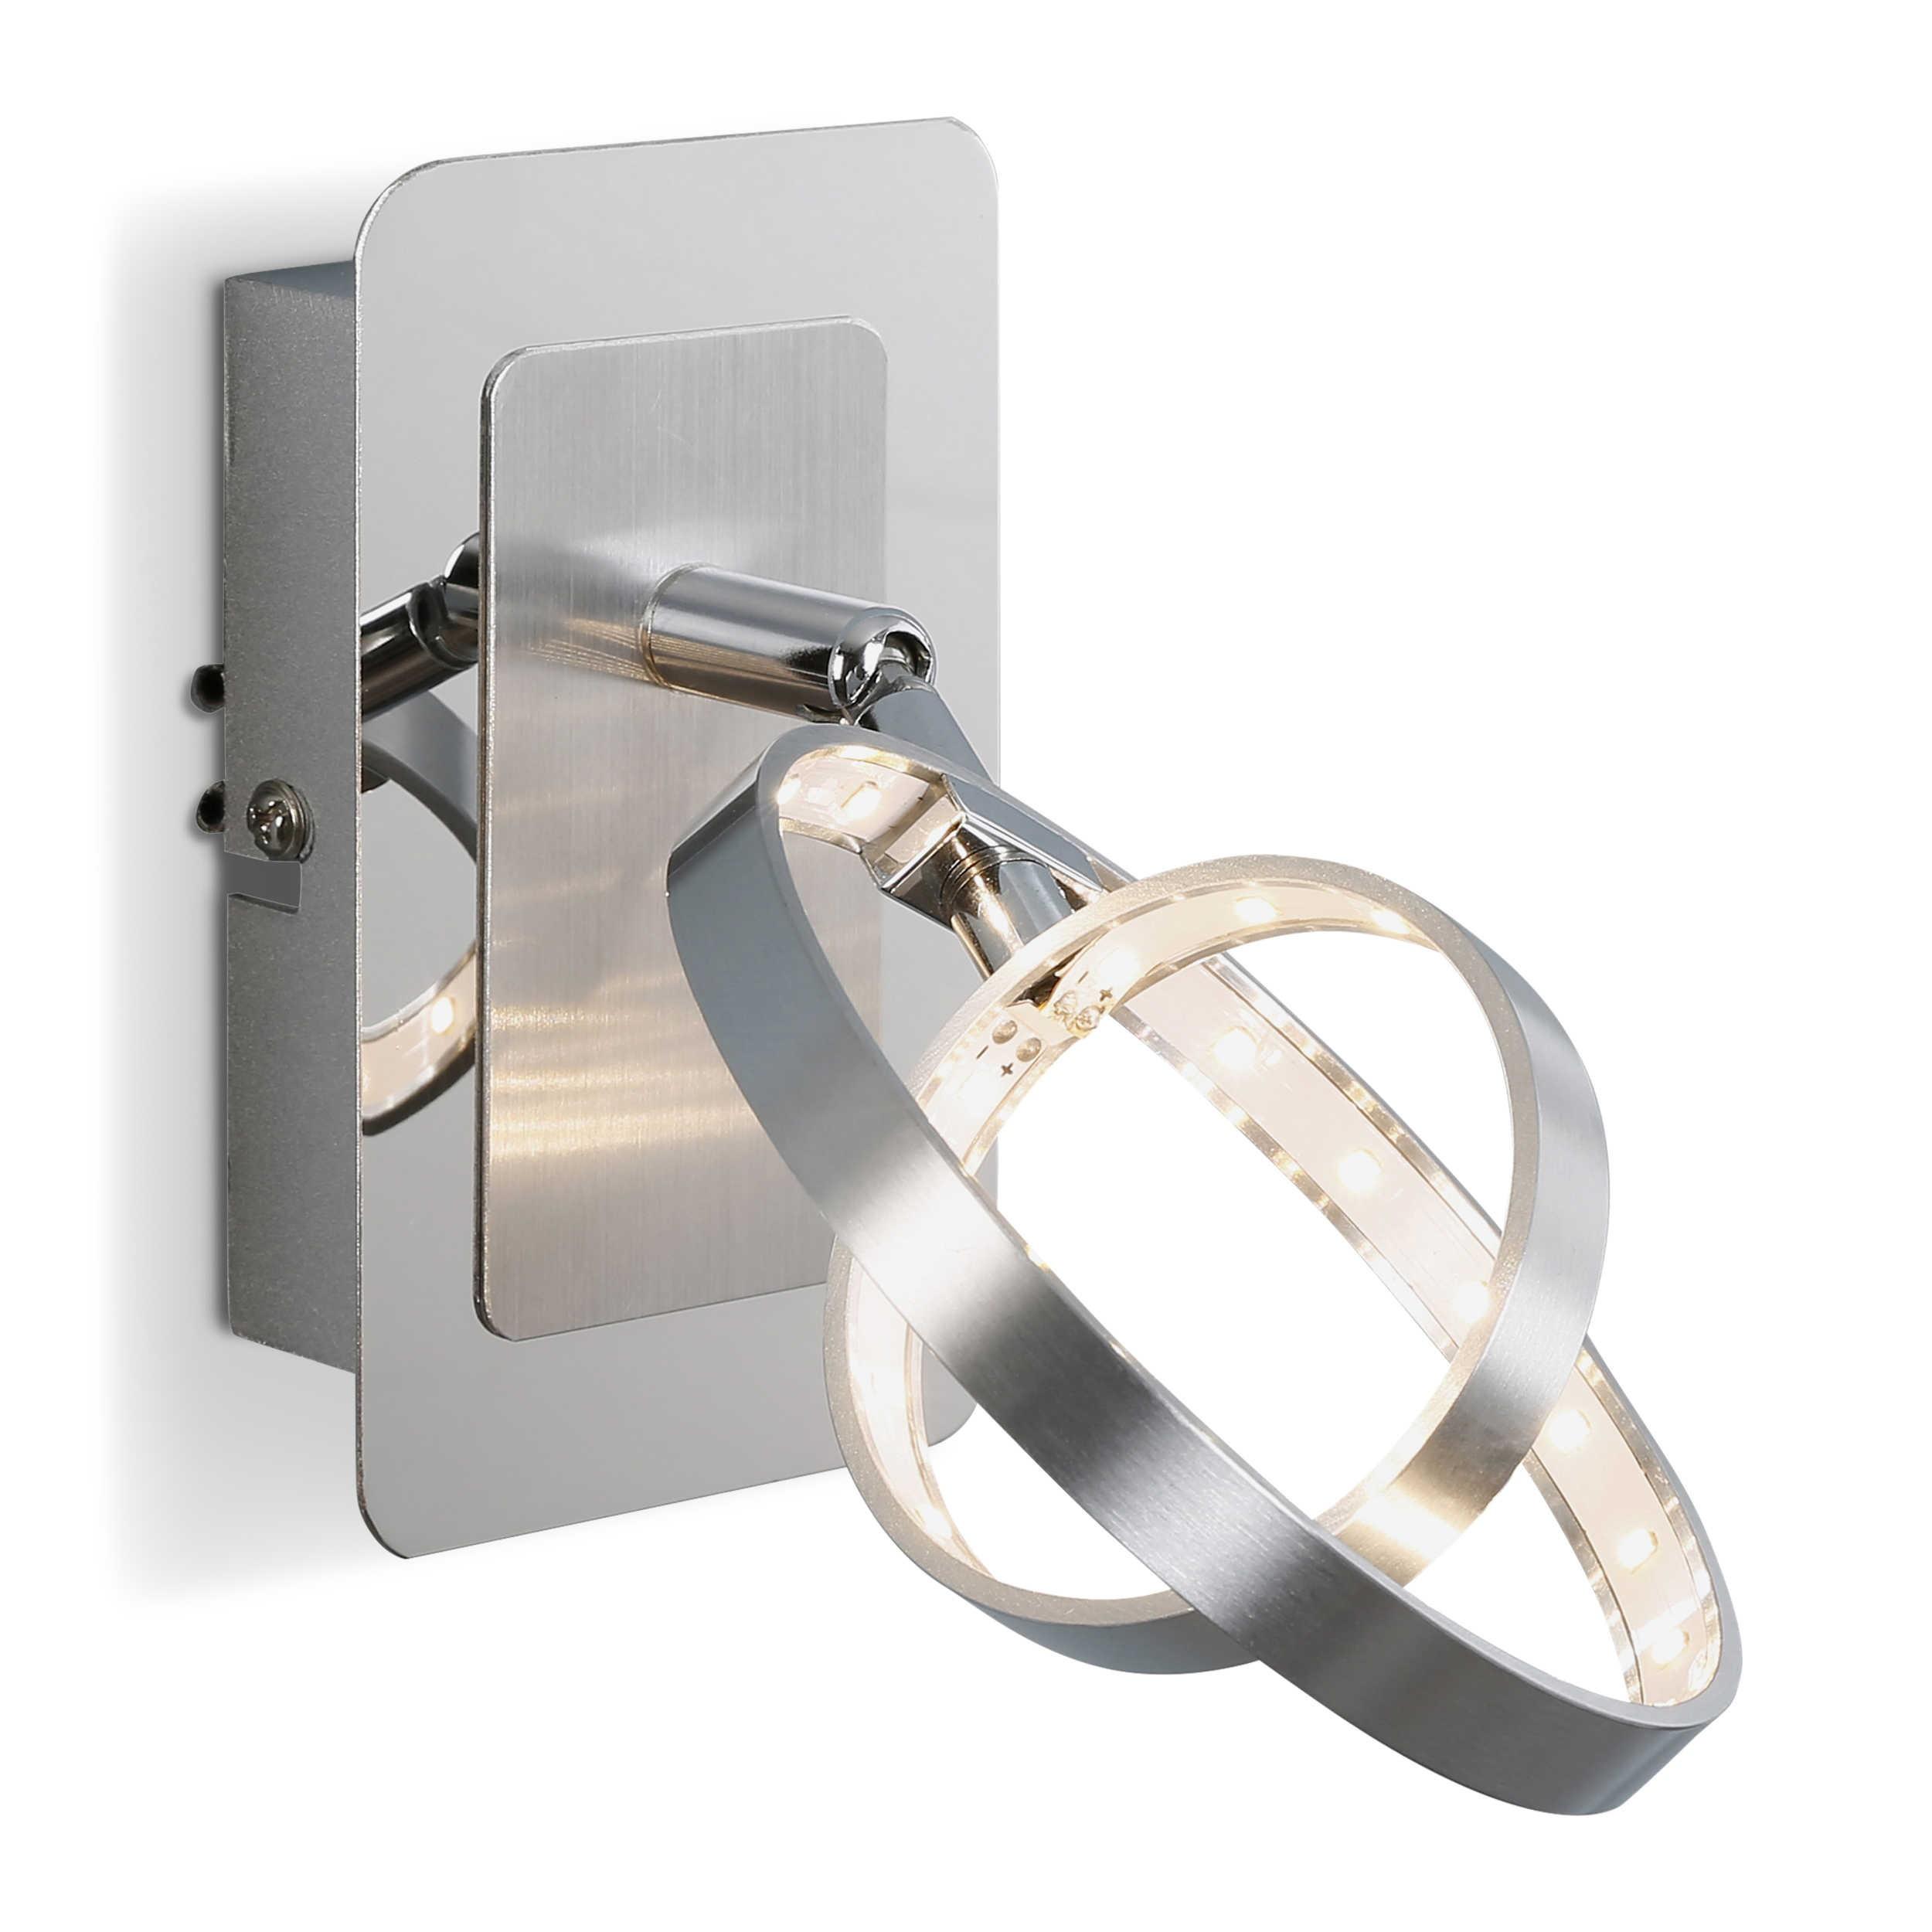 reality leuchten led wandleuchte a silber aluminium online kaufen bei woonio. Black Bedroom Furniture Sets. Home Design Ideas